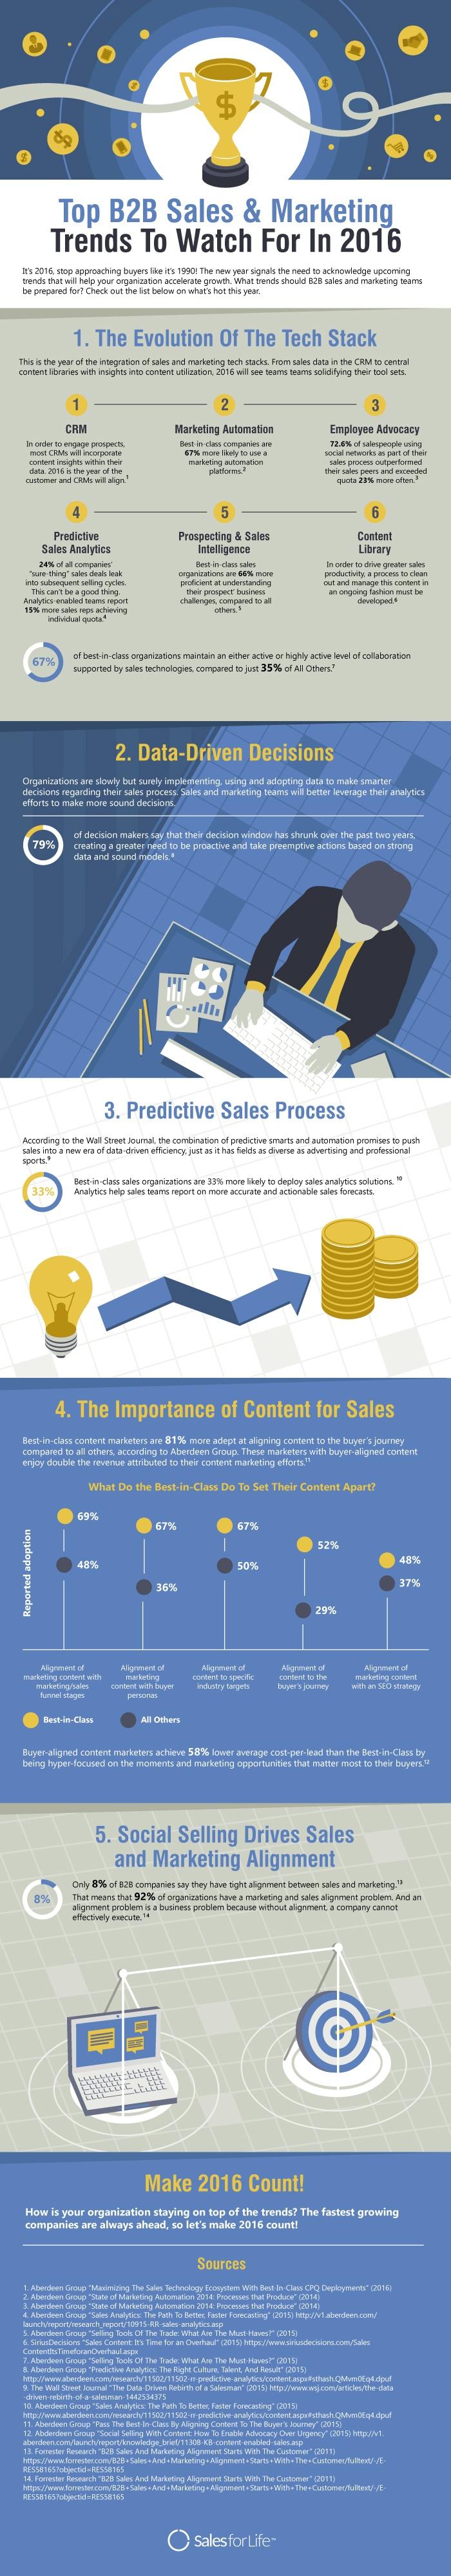 sales-marketing-trends-2016-infographic.jpg